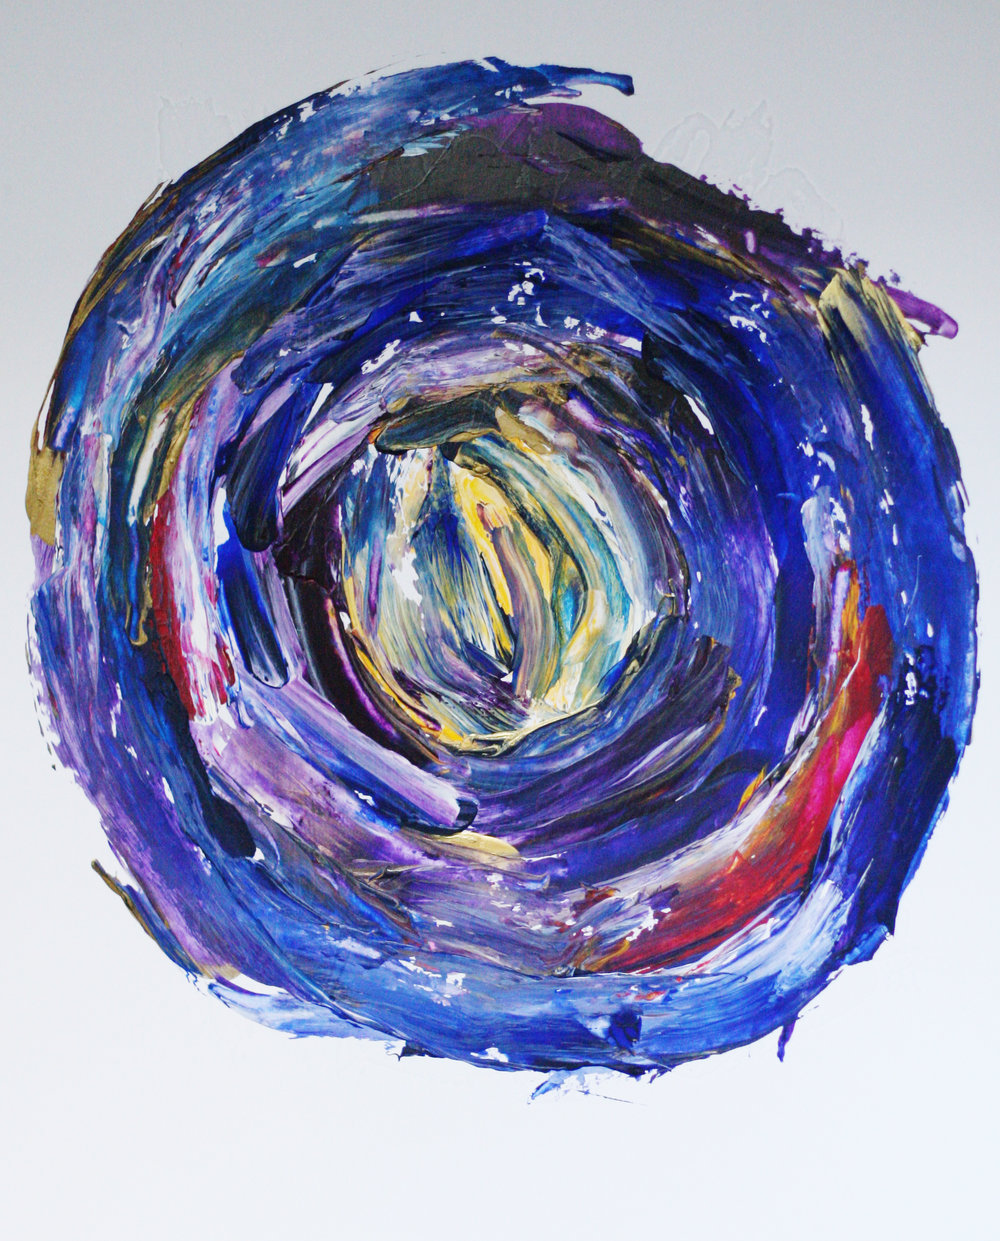 Lux Aeterna - Clint Mansell